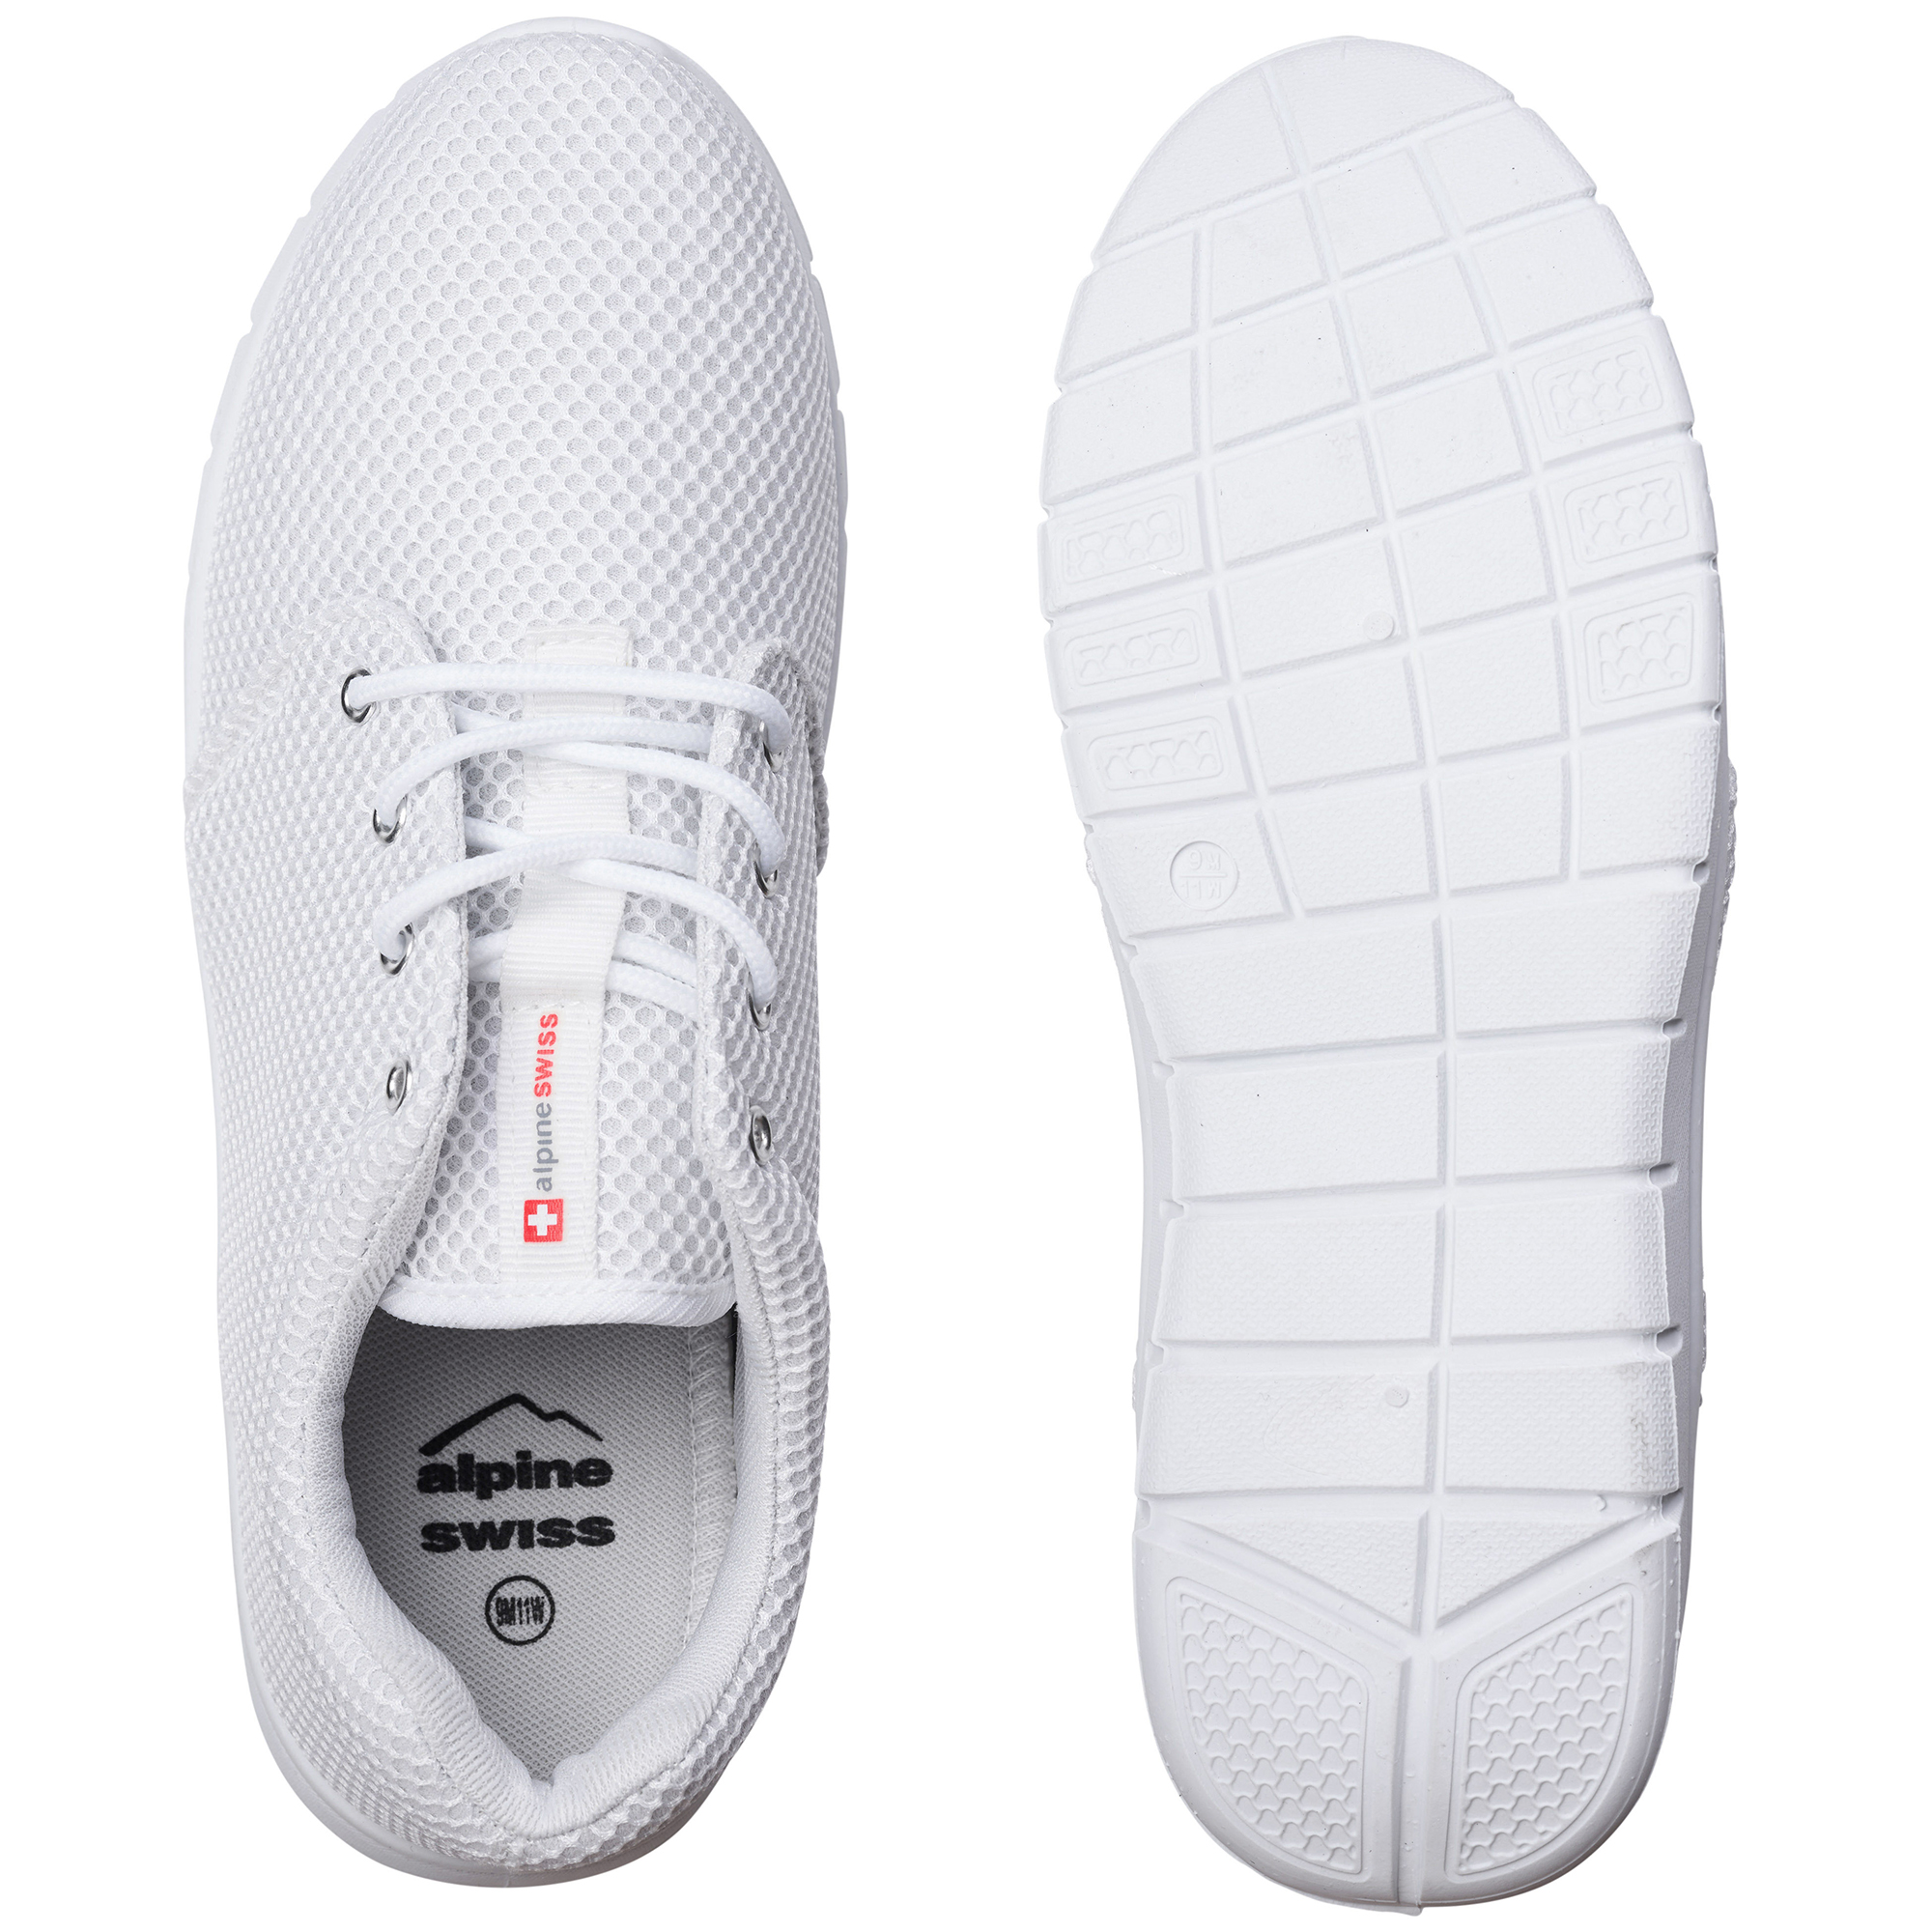 Alpine-Swiss-Kilian-Mesh-Sneakers-Casual-Shoes-Mens-amp-Womens-Lightweight-Trainer